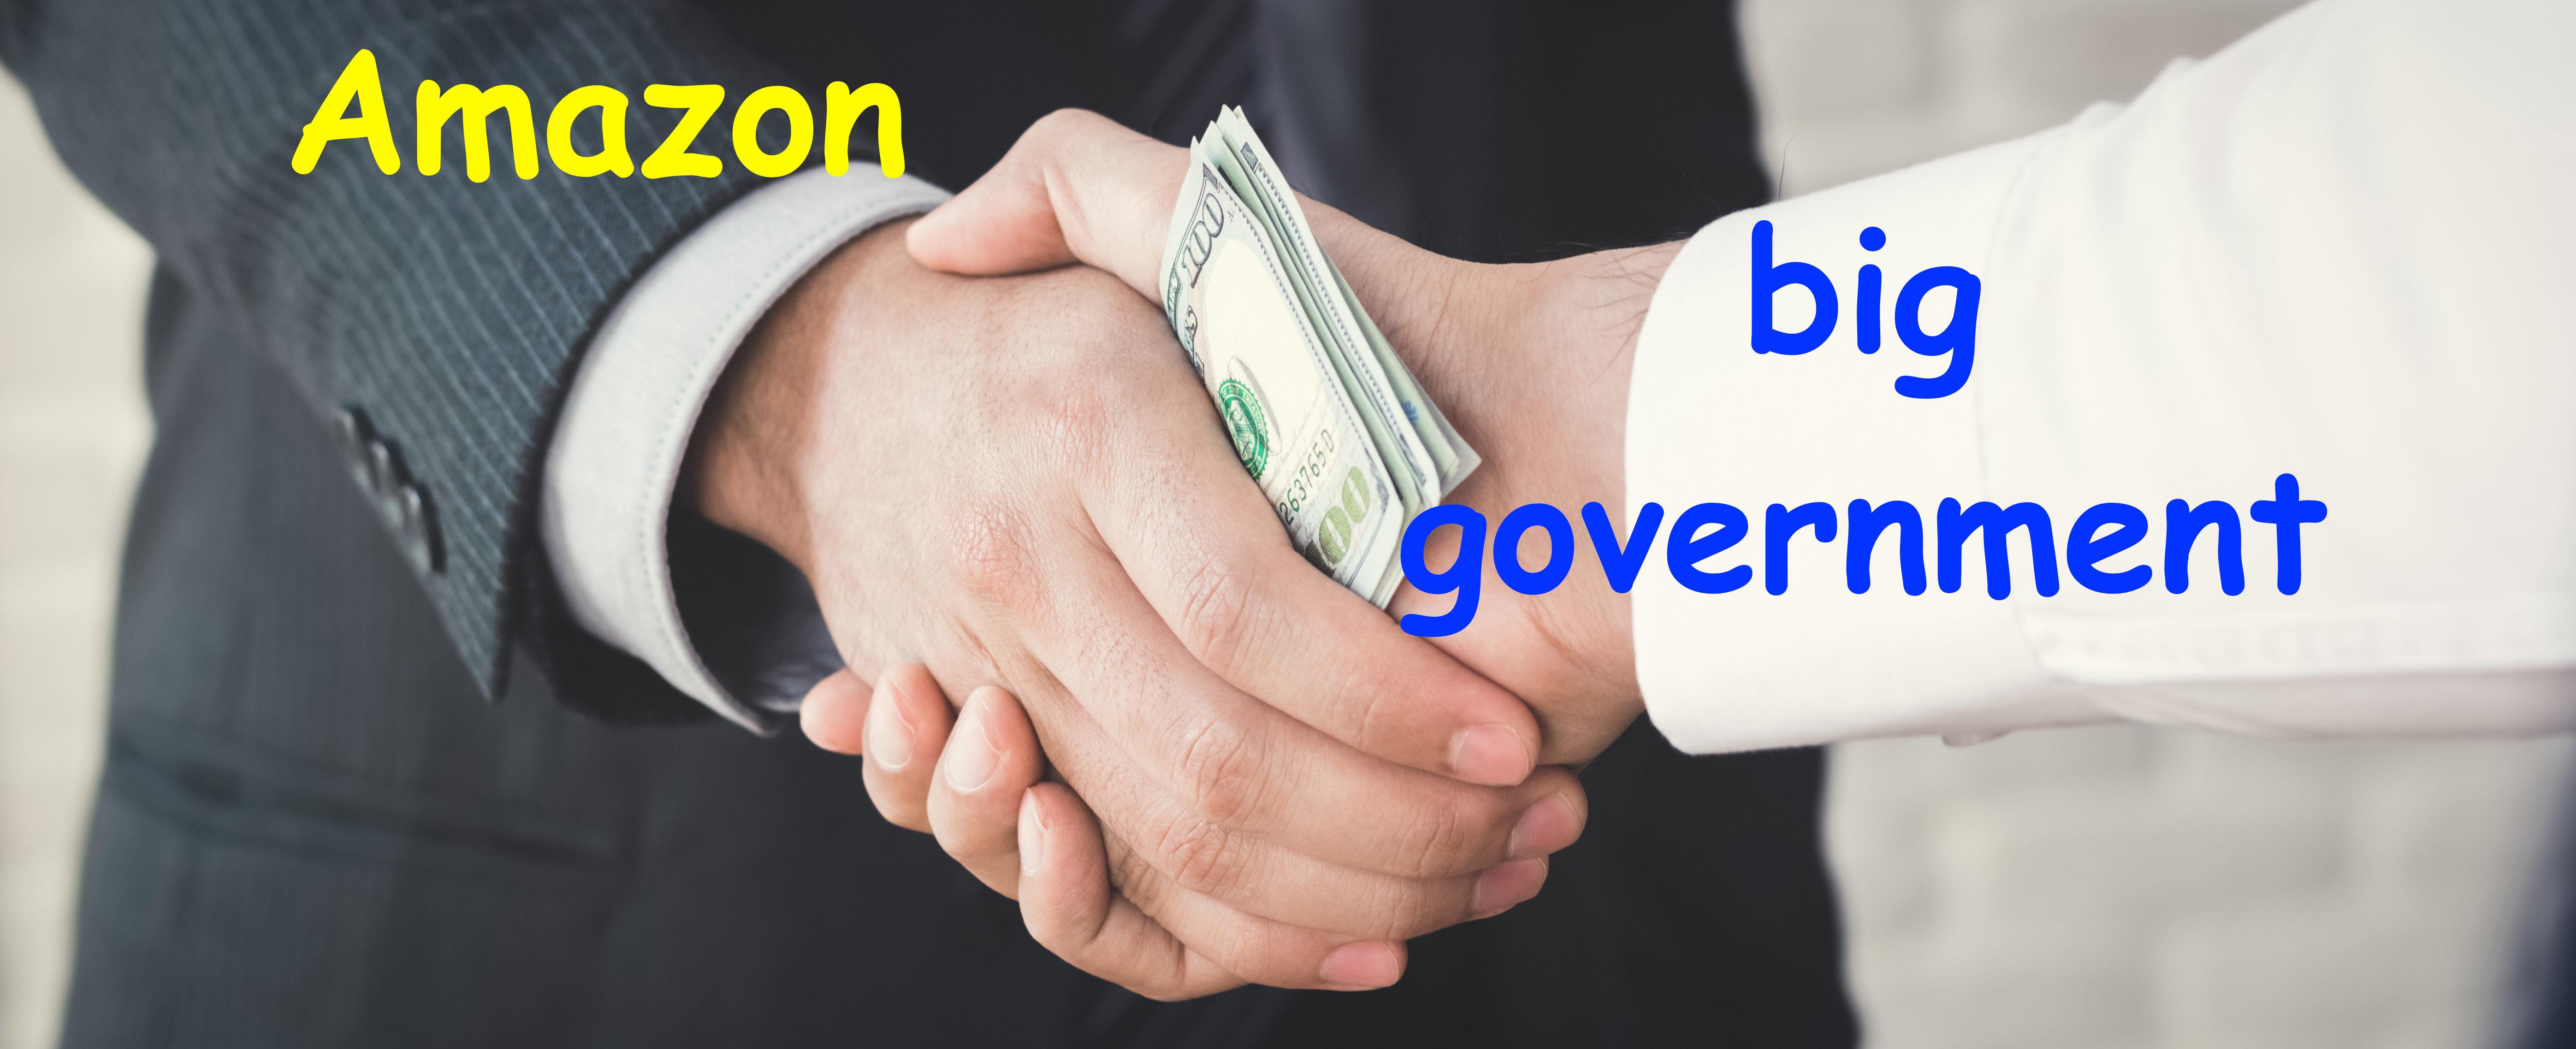 Cronyism, Shutterstock